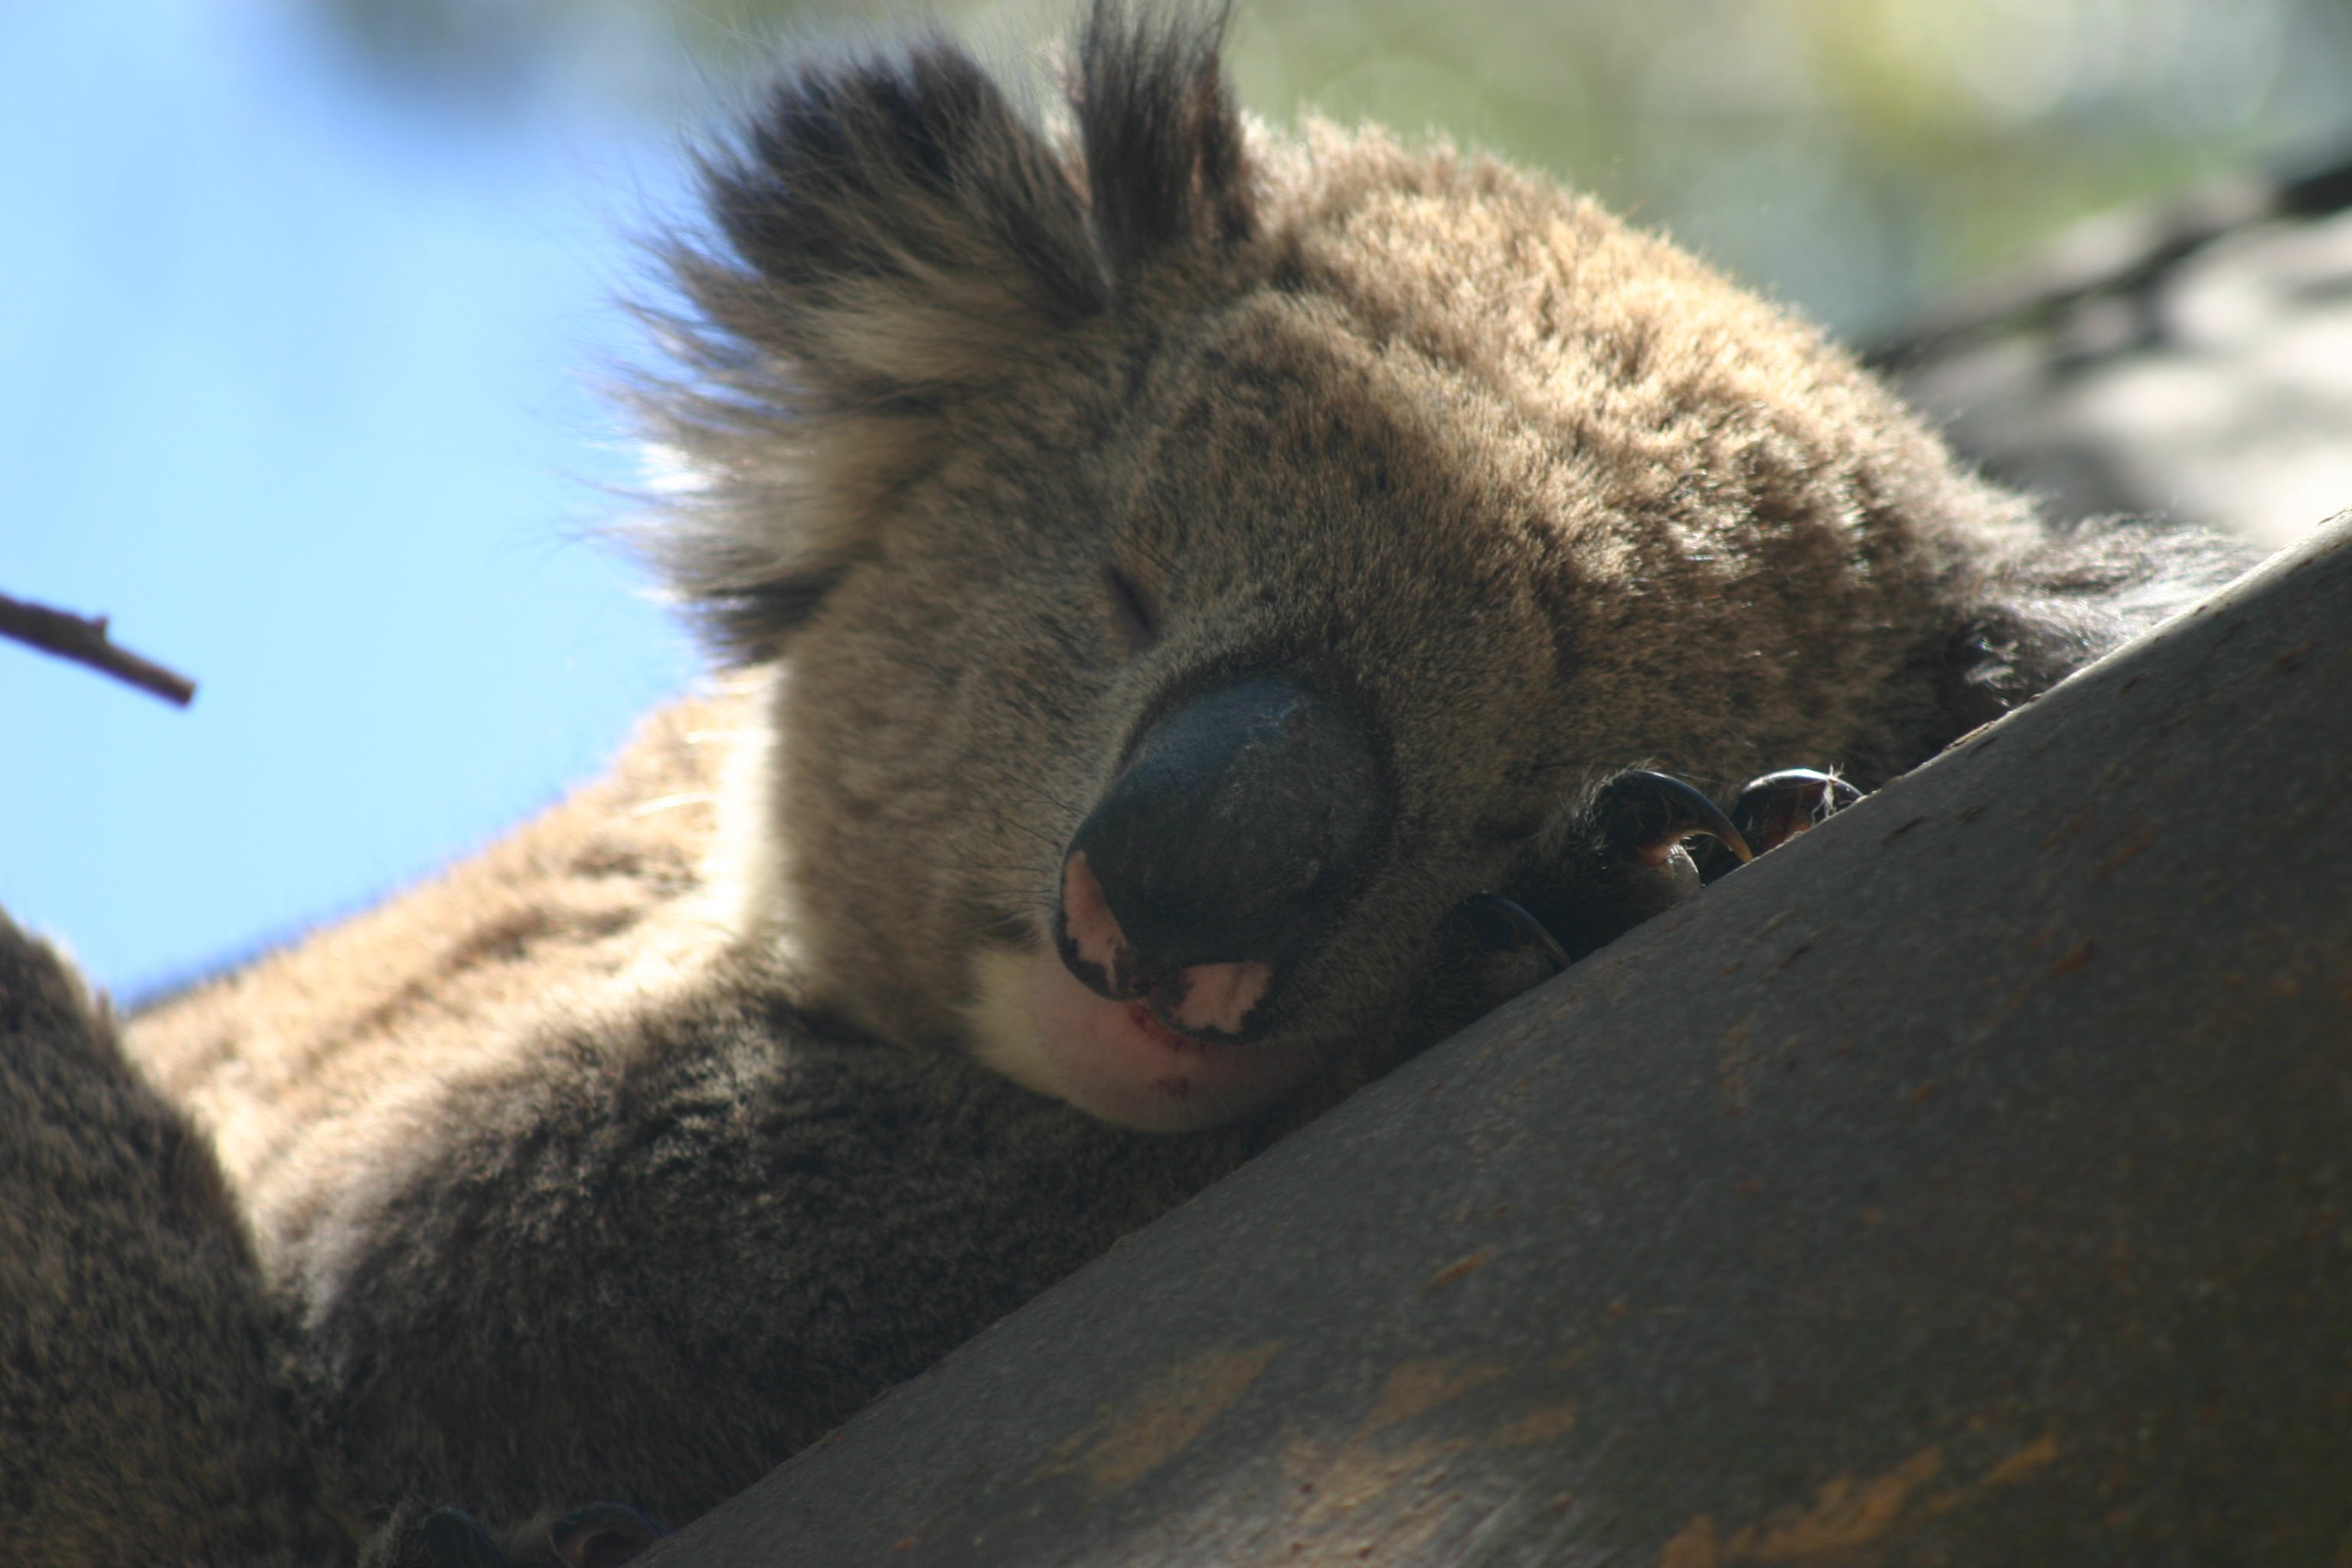 Koala (Image: J. Facelli)